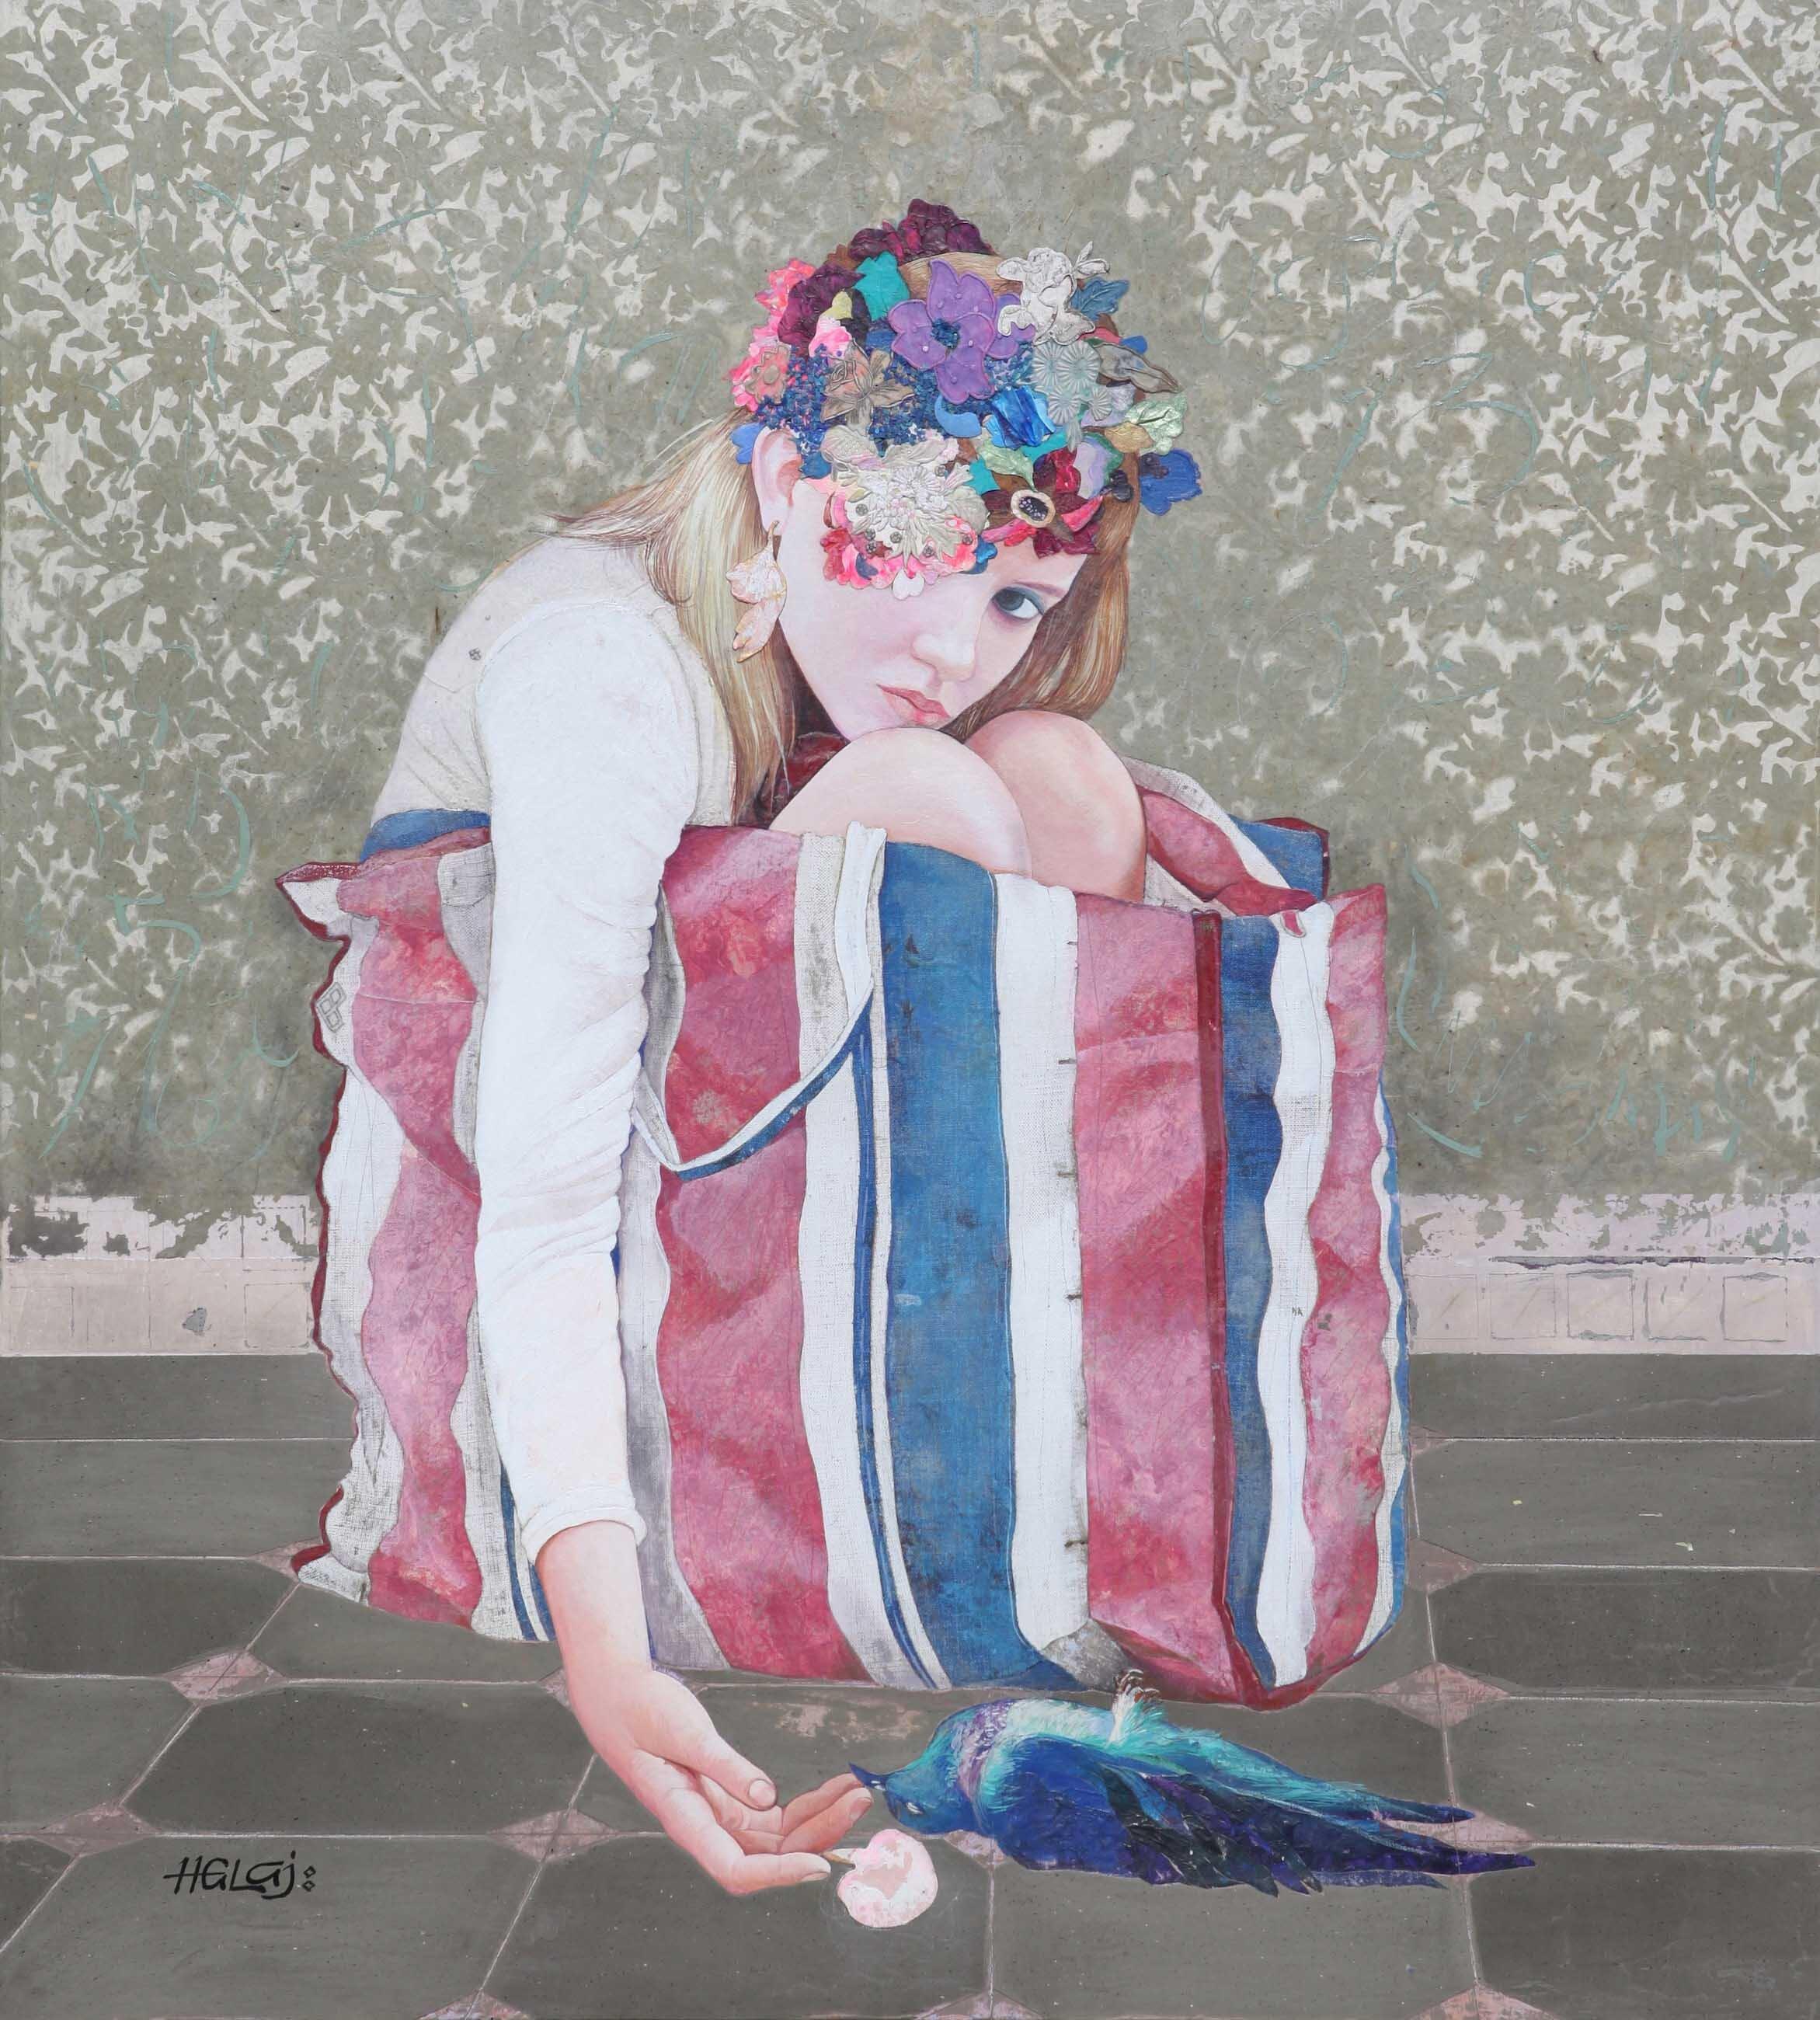 "Minas Halaj "" Floral Mind # 51 "" 2018, oil, textile, wax, mixed media on panel, 40x36 inches ( 101.6x91.44 ).jpg"